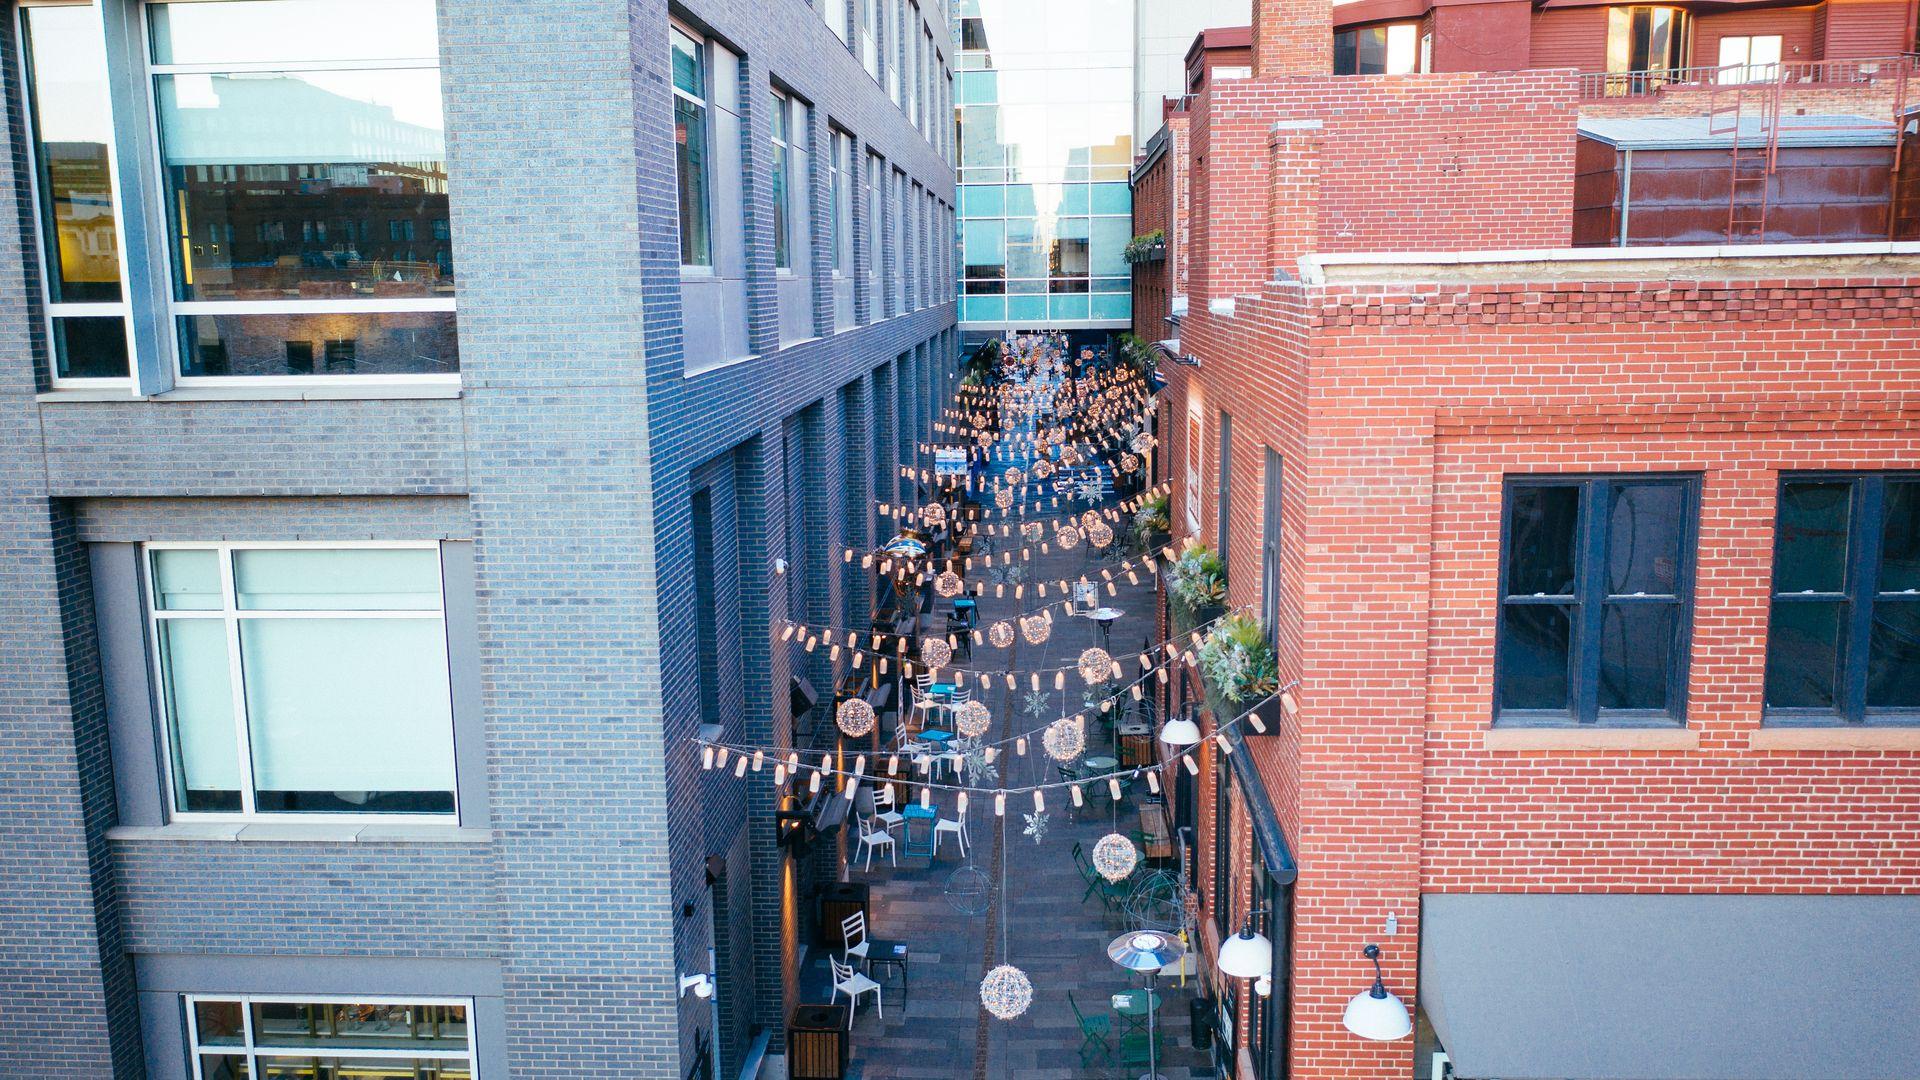 Dairy Block in Denver. Photo courtesy of UNUM:collaborative